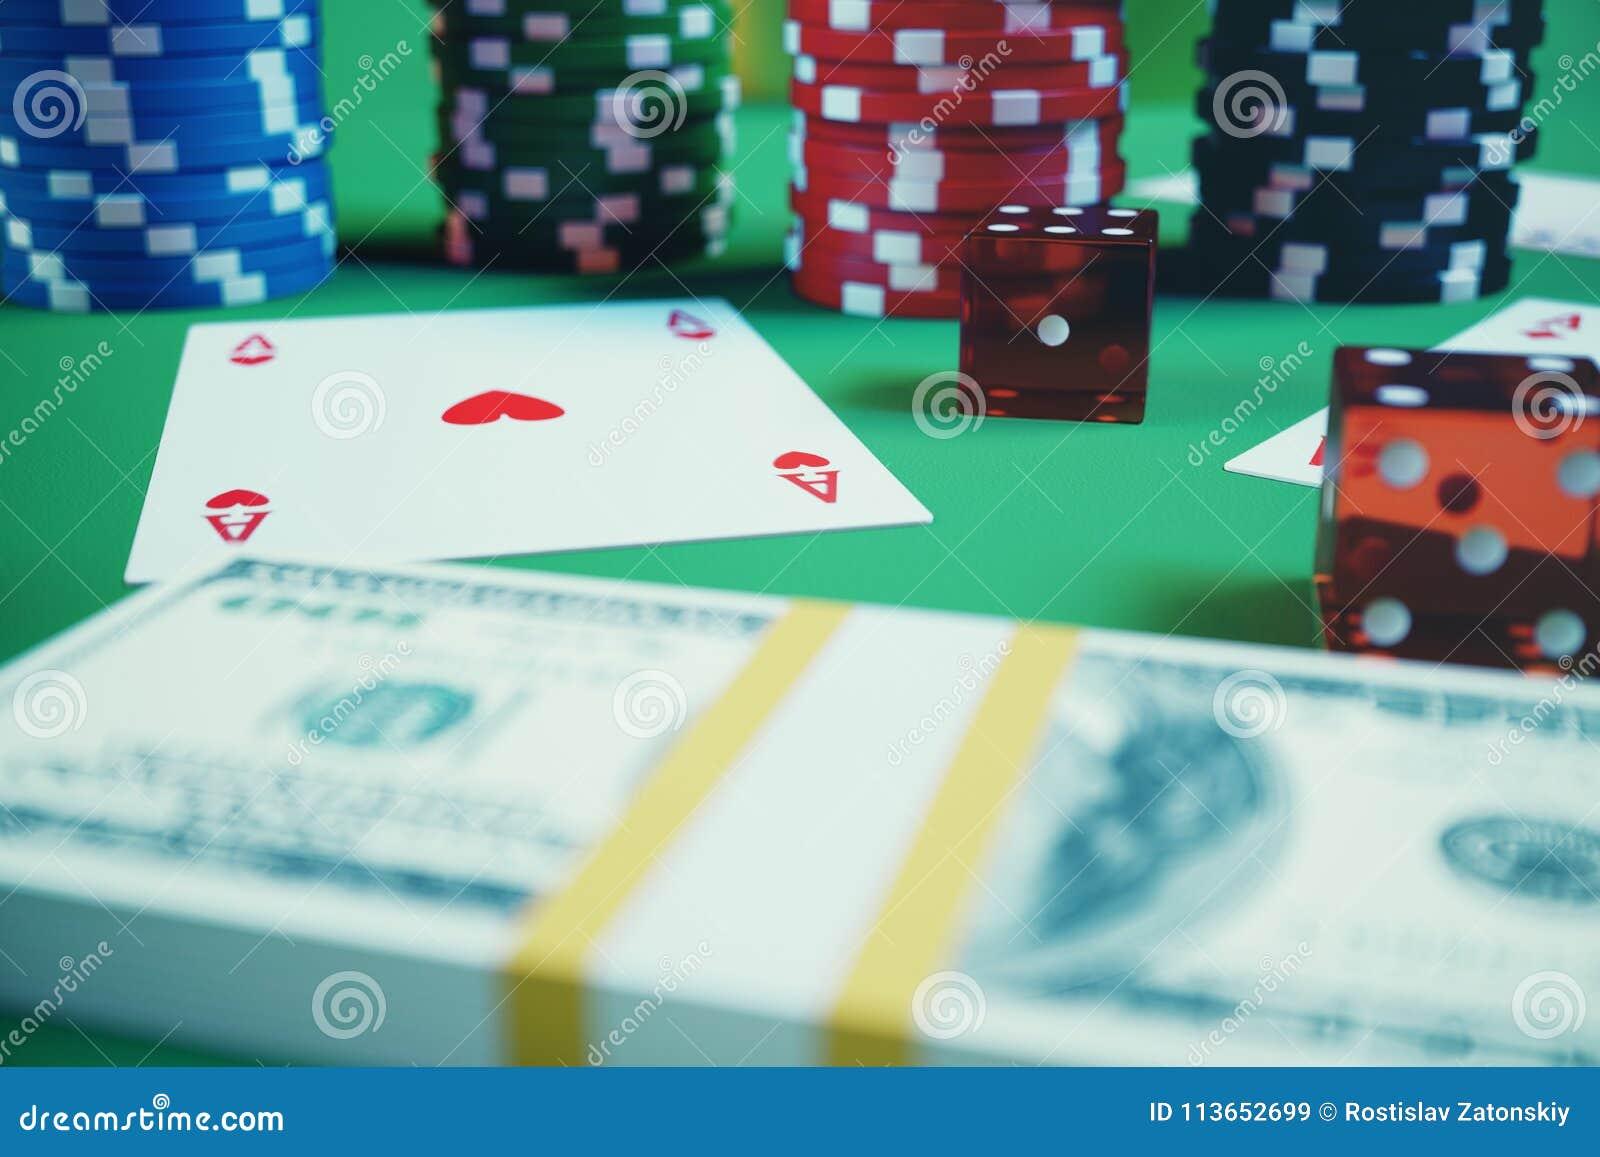 best rtg casinos